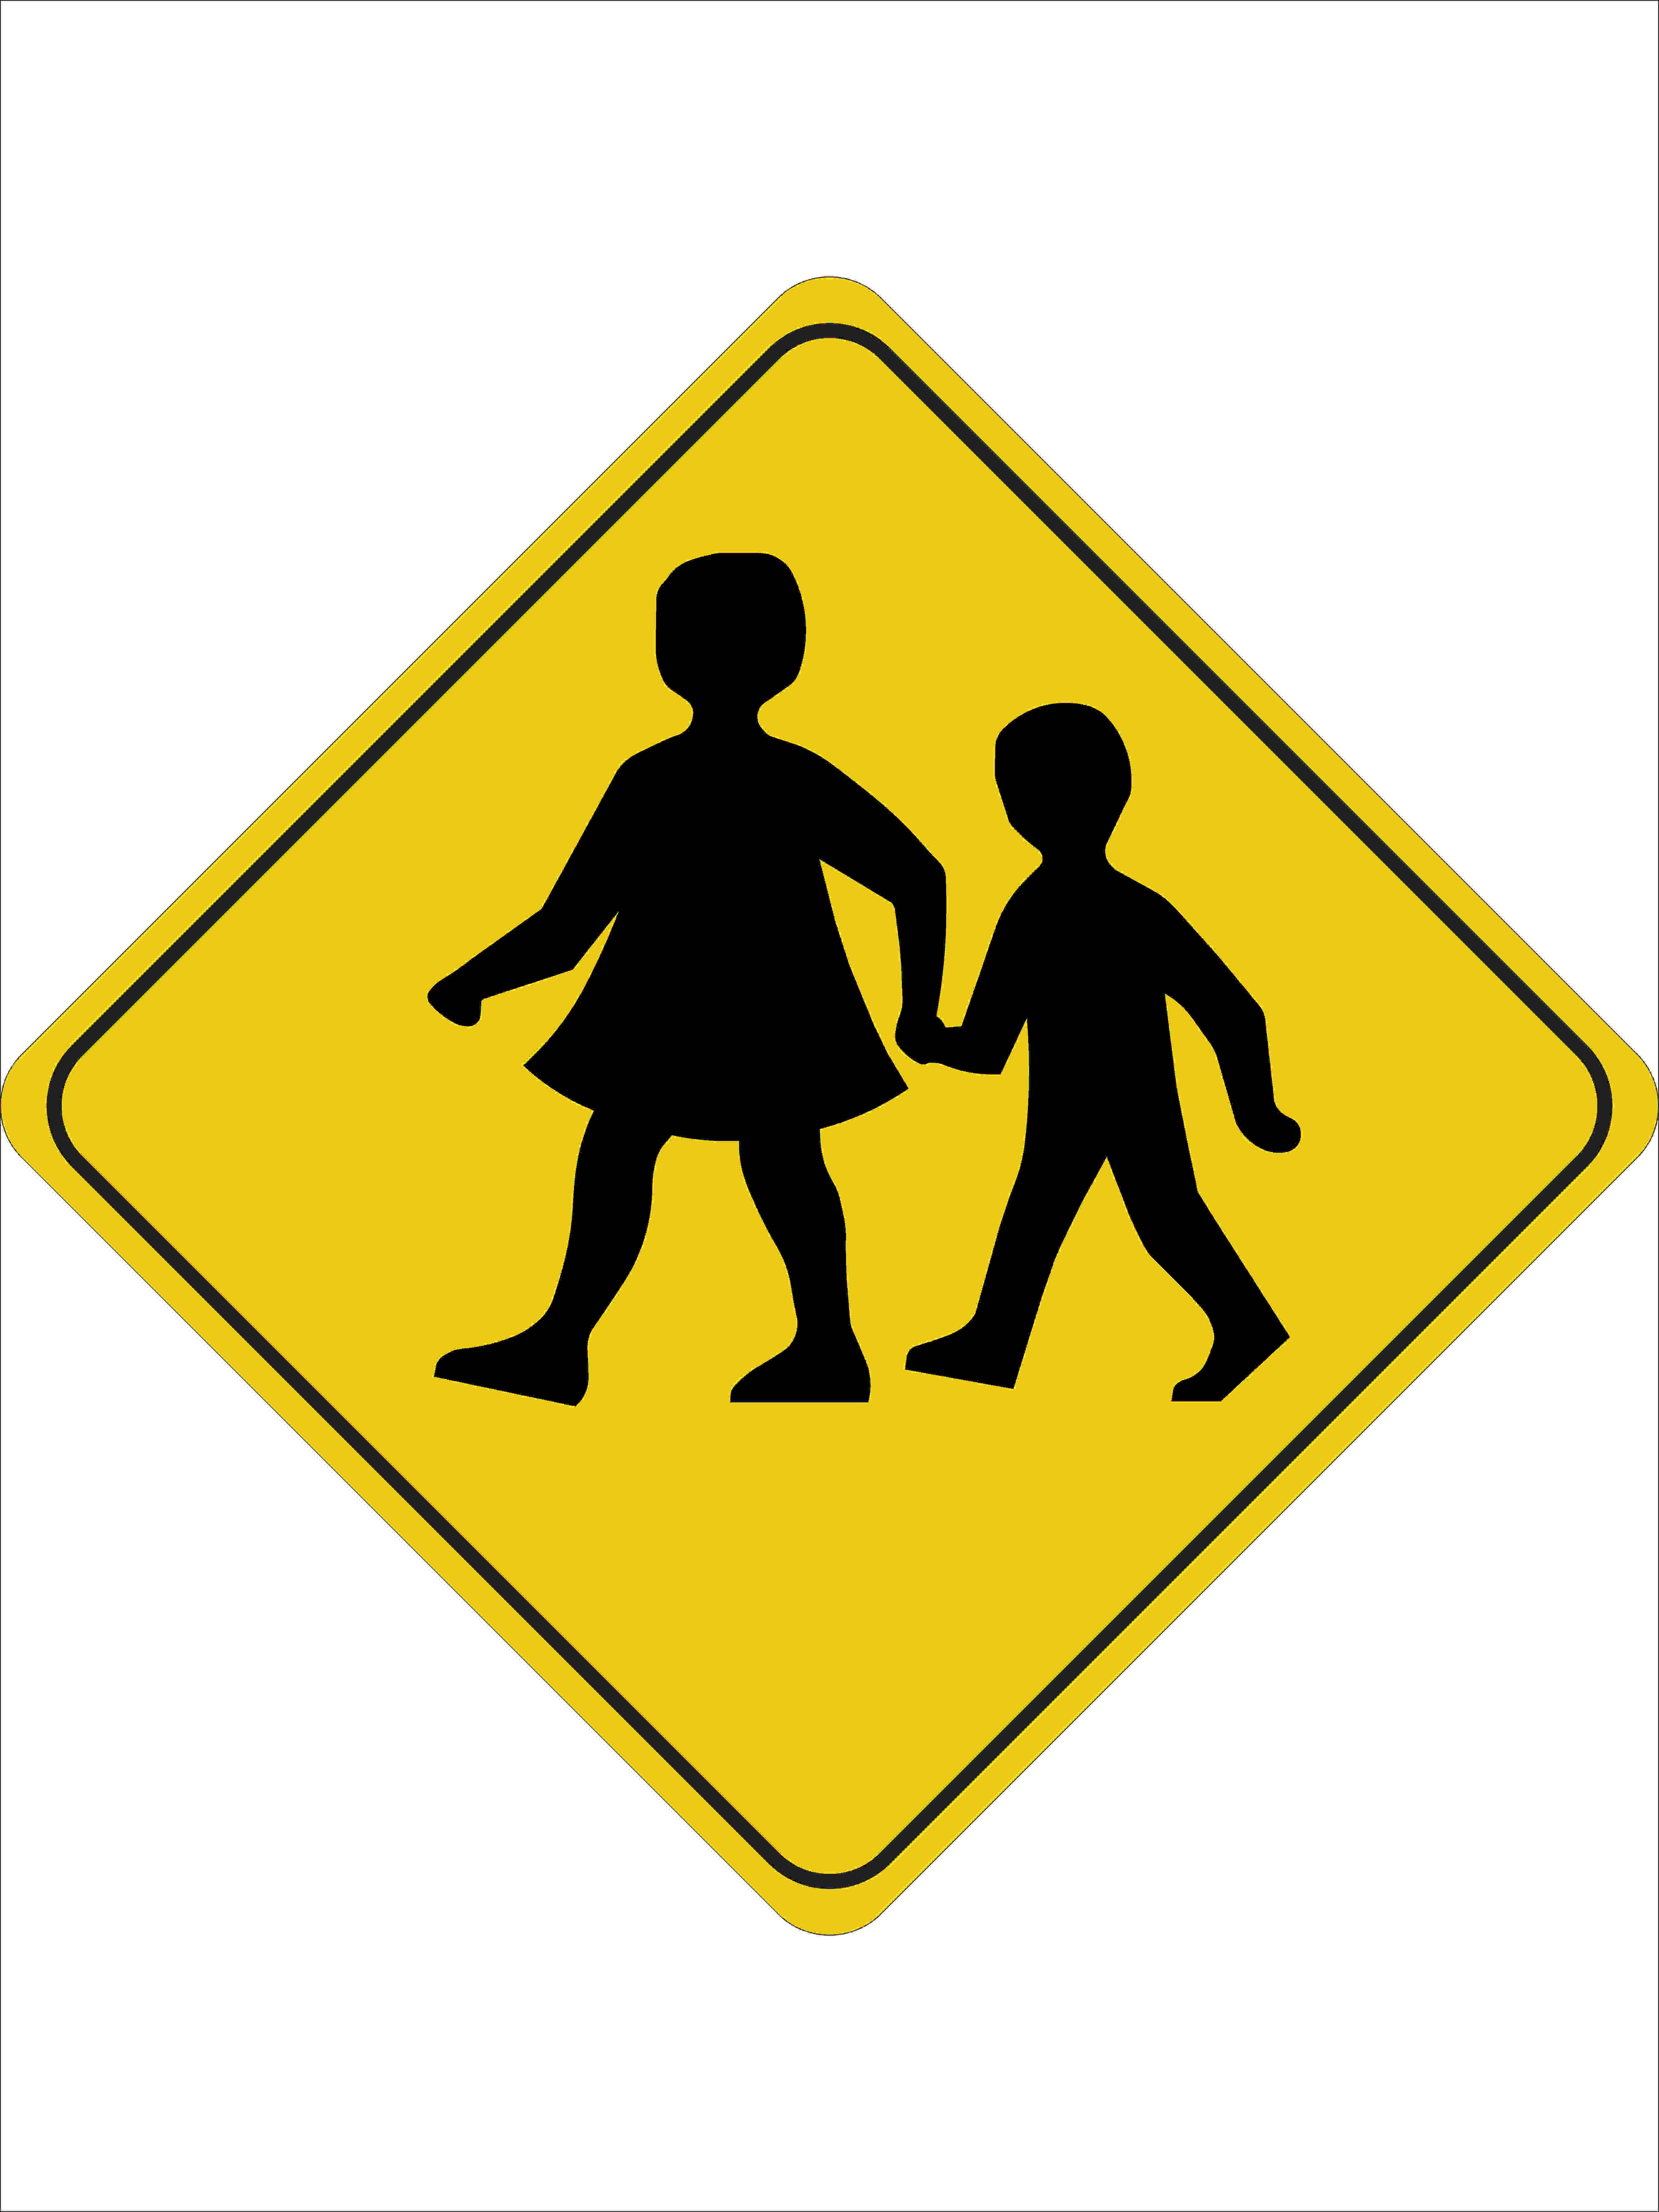 Traffic Signs CHILDREN CROSSING